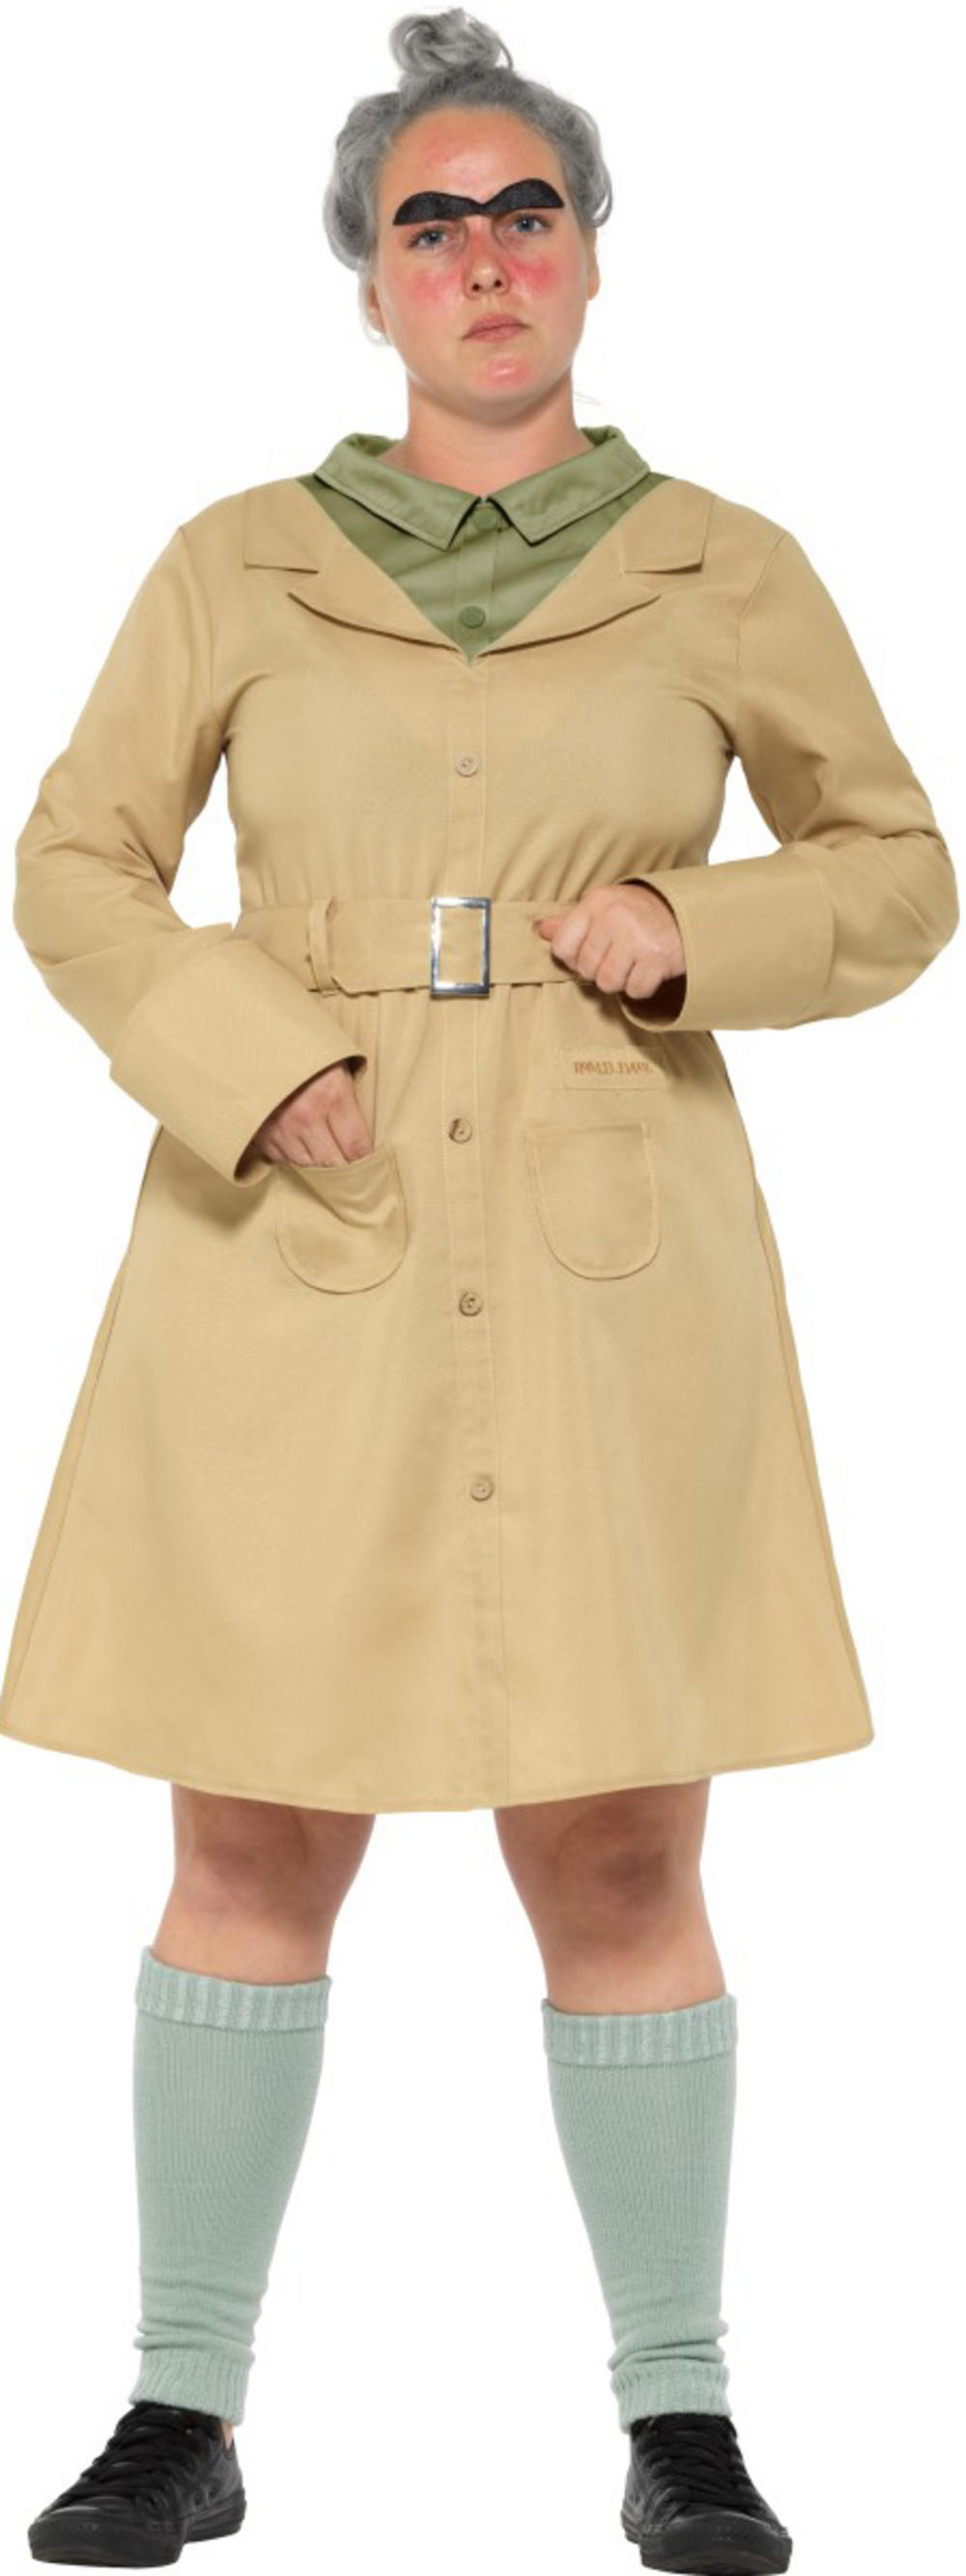 Roald Dahl Miss Trunchbull Ladies Costume